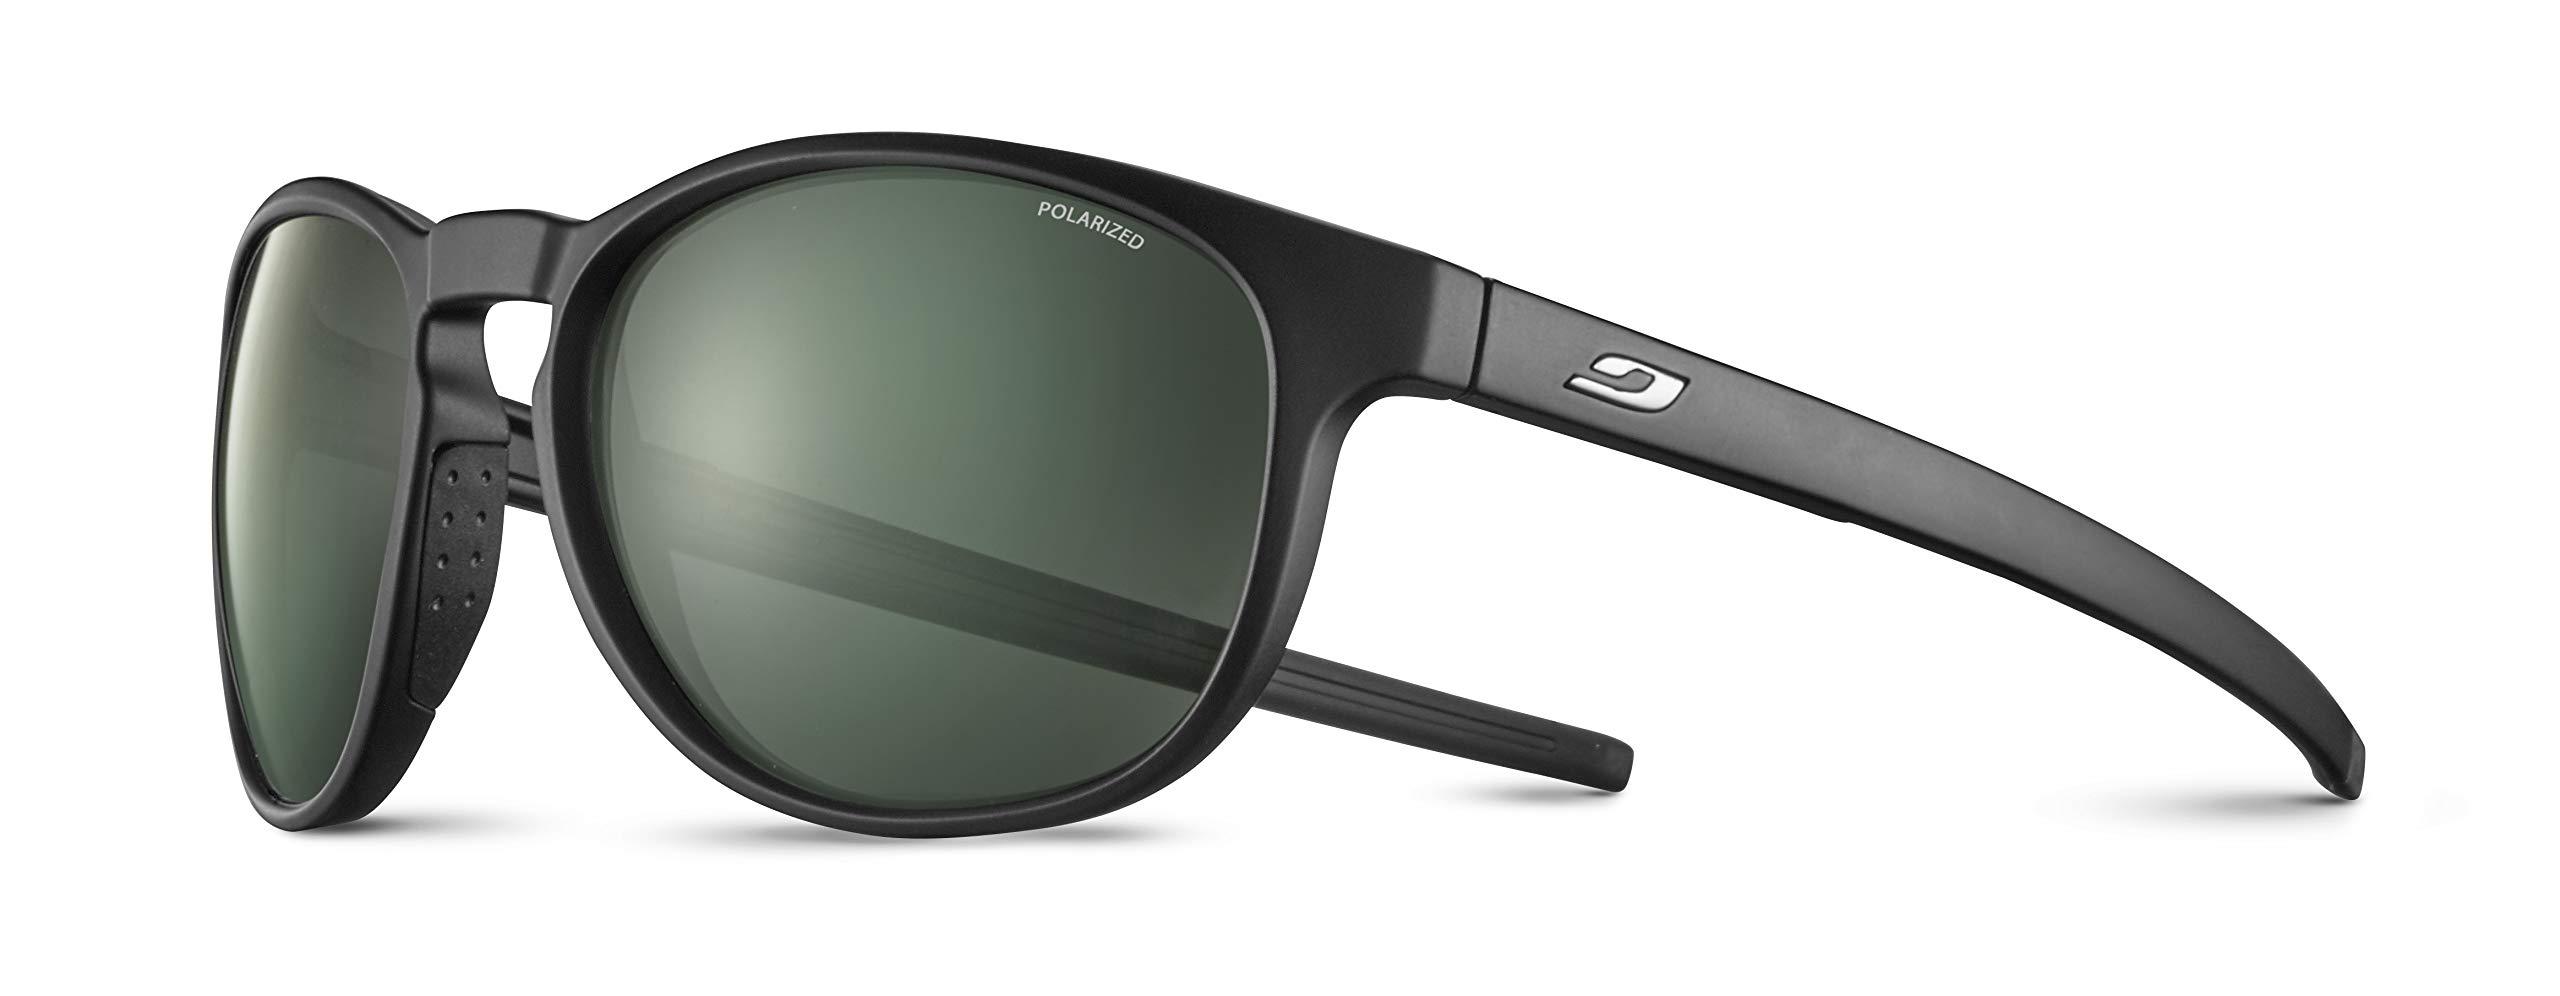 Julbo Elevate Performance Sunglasses - Polarized 3 - Black/Black